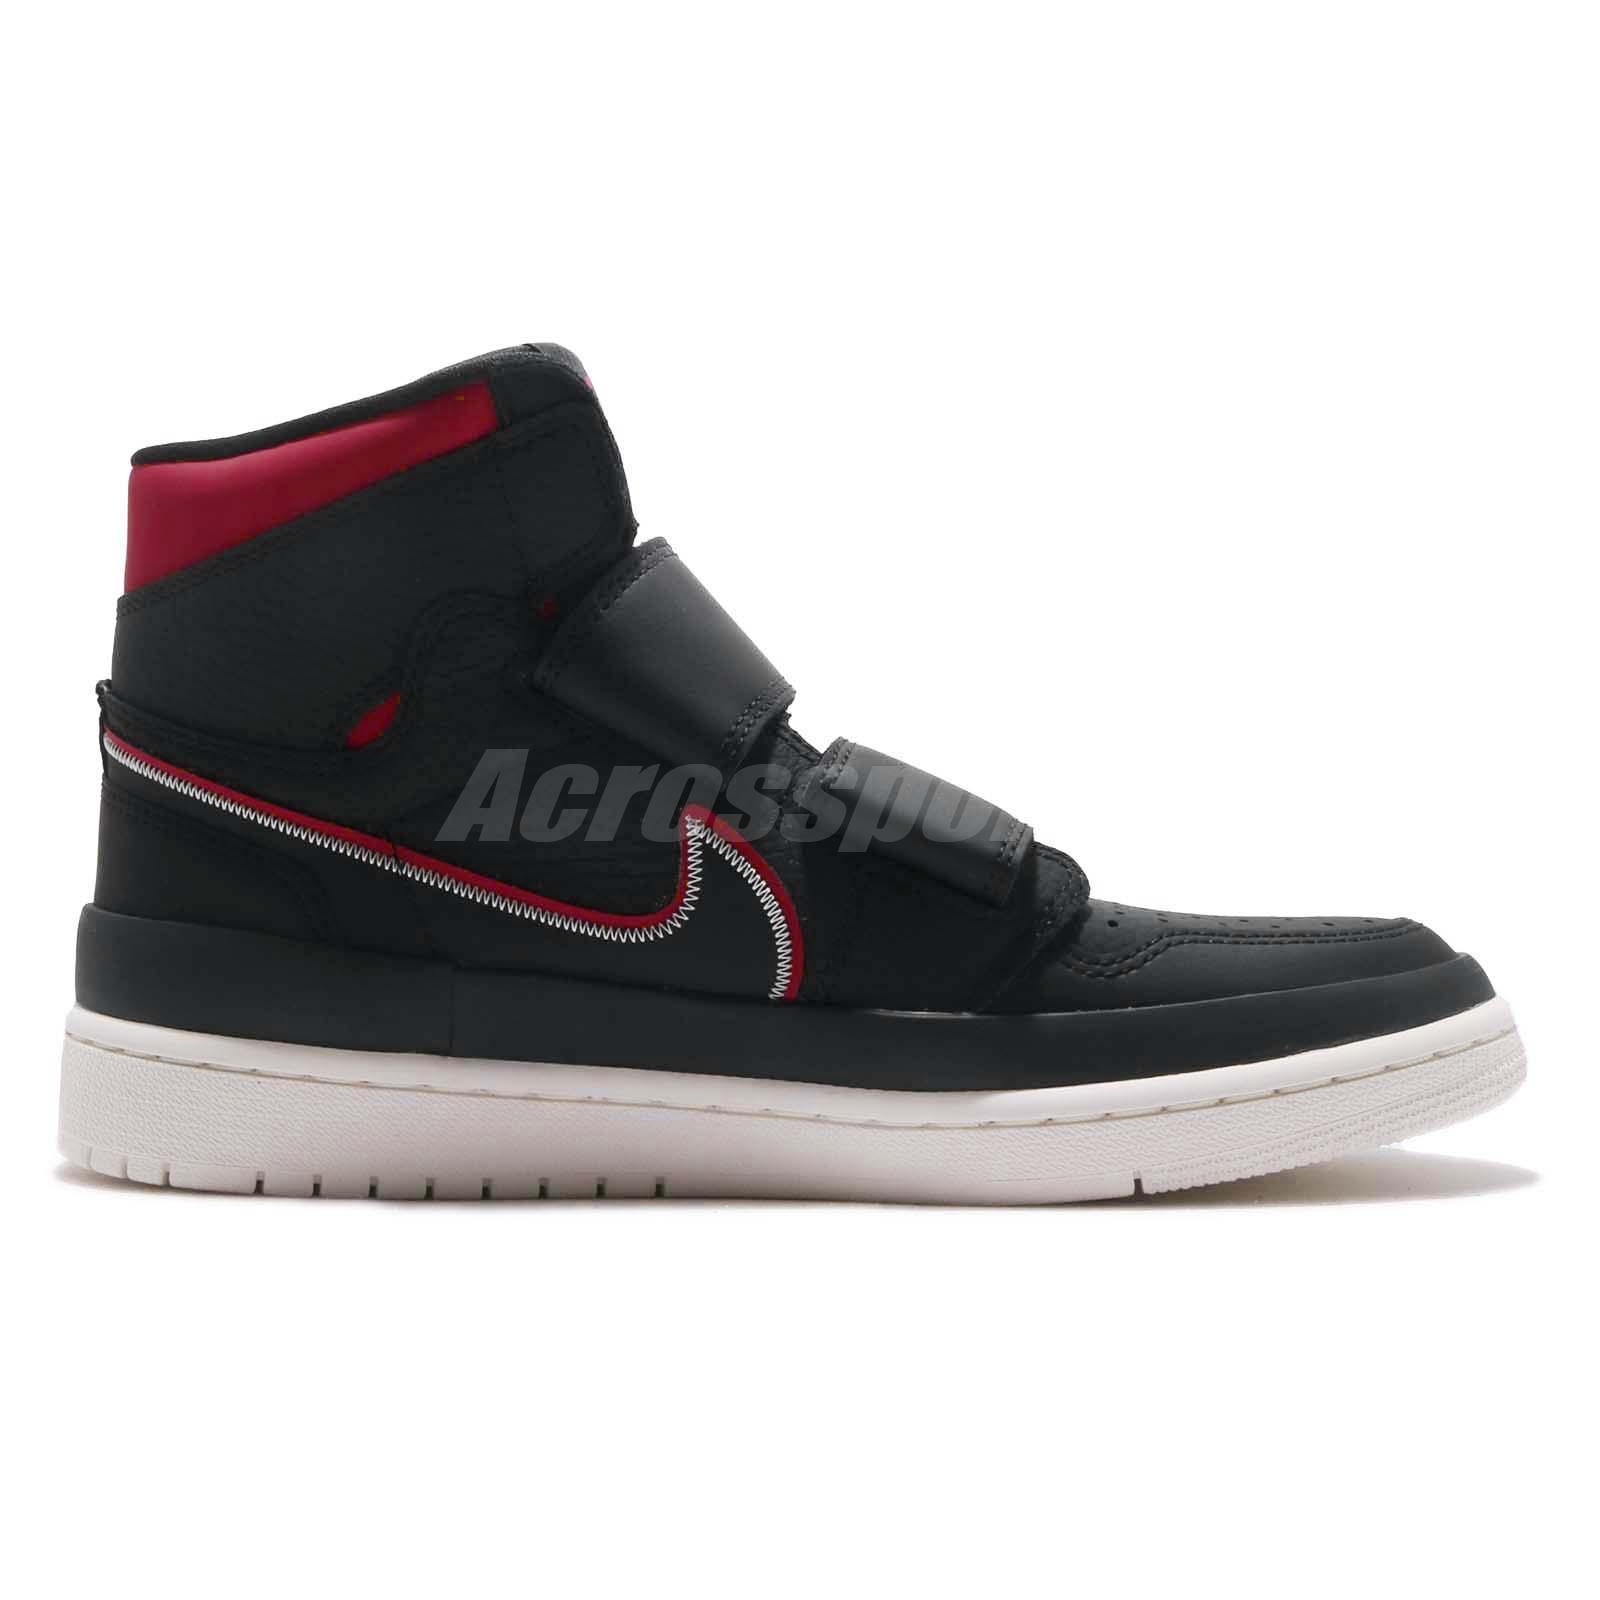 082d68c299349d Nike Air Jordan 1 RE Hi Double STRP Strap I AJ1 Black Red Men Shoes ...